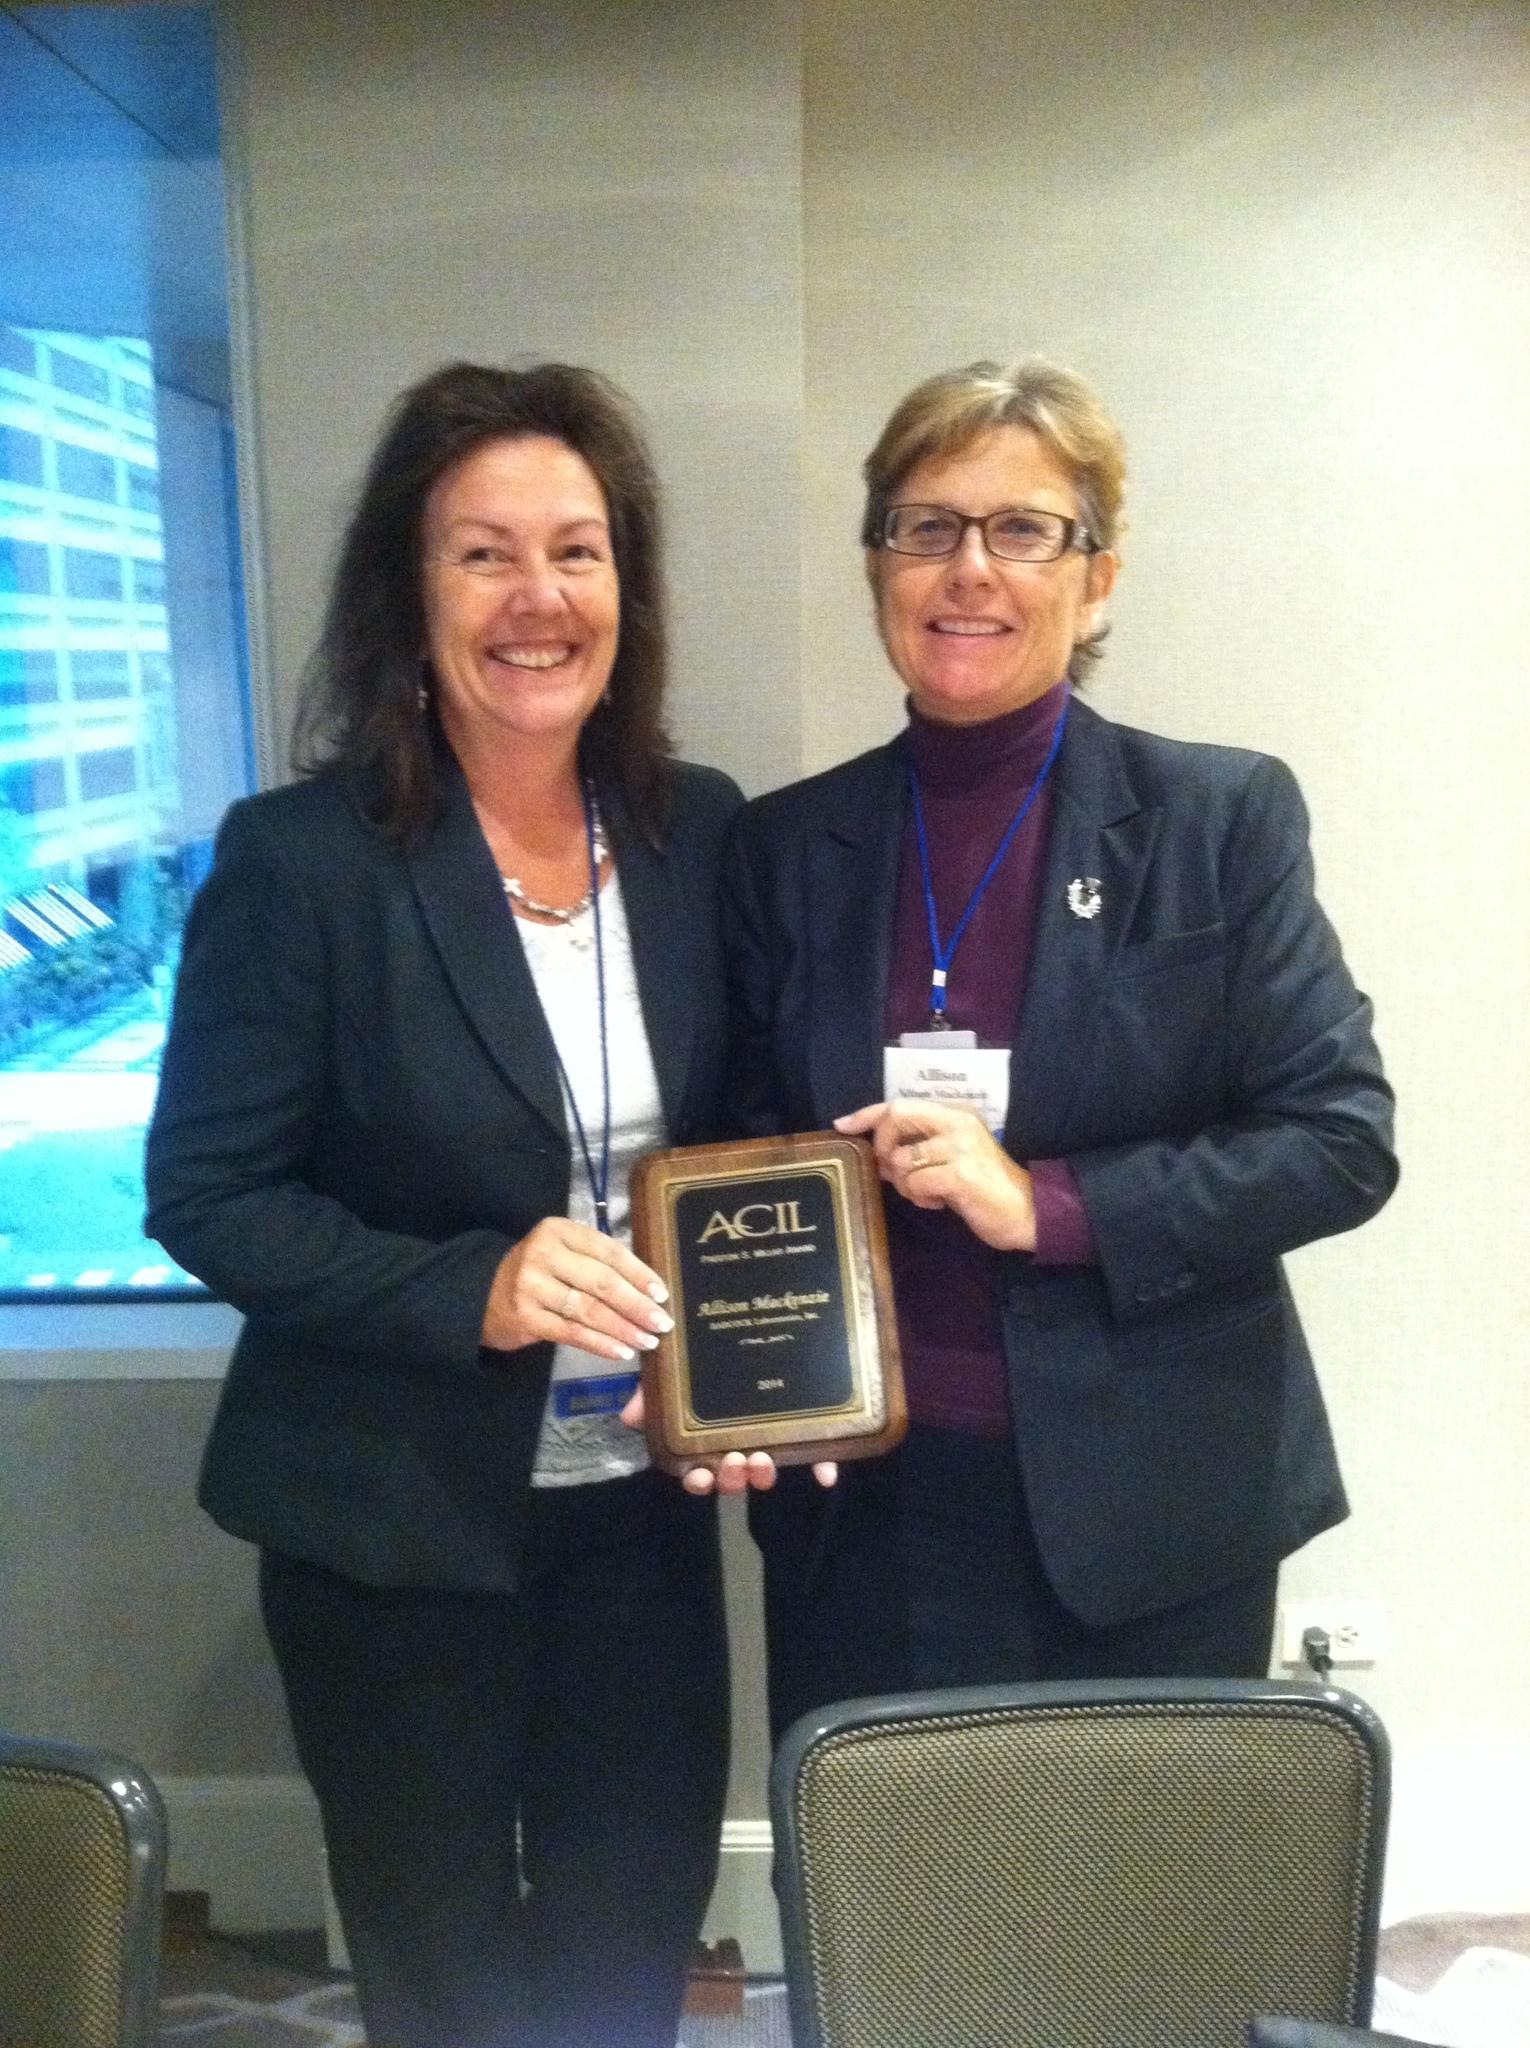 Our CEO Allison Mackenzie is a two-time recipient of the prestigious Preston Millar Award from ACIL